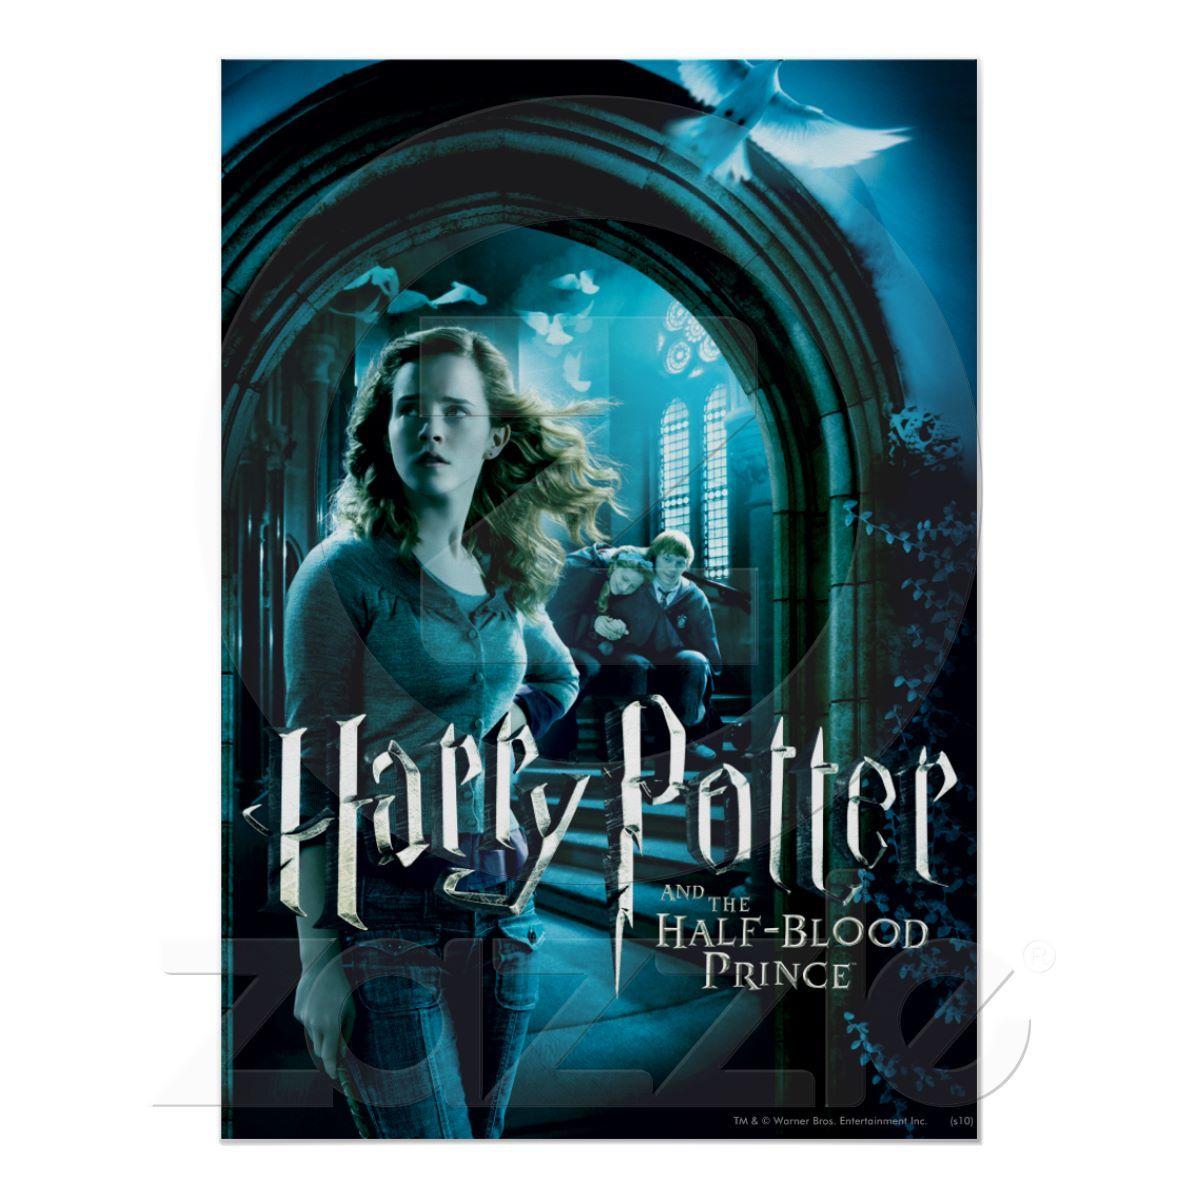 Harry potter stil zimmer hermione granger  poster  all harry potter all the time  pinterest